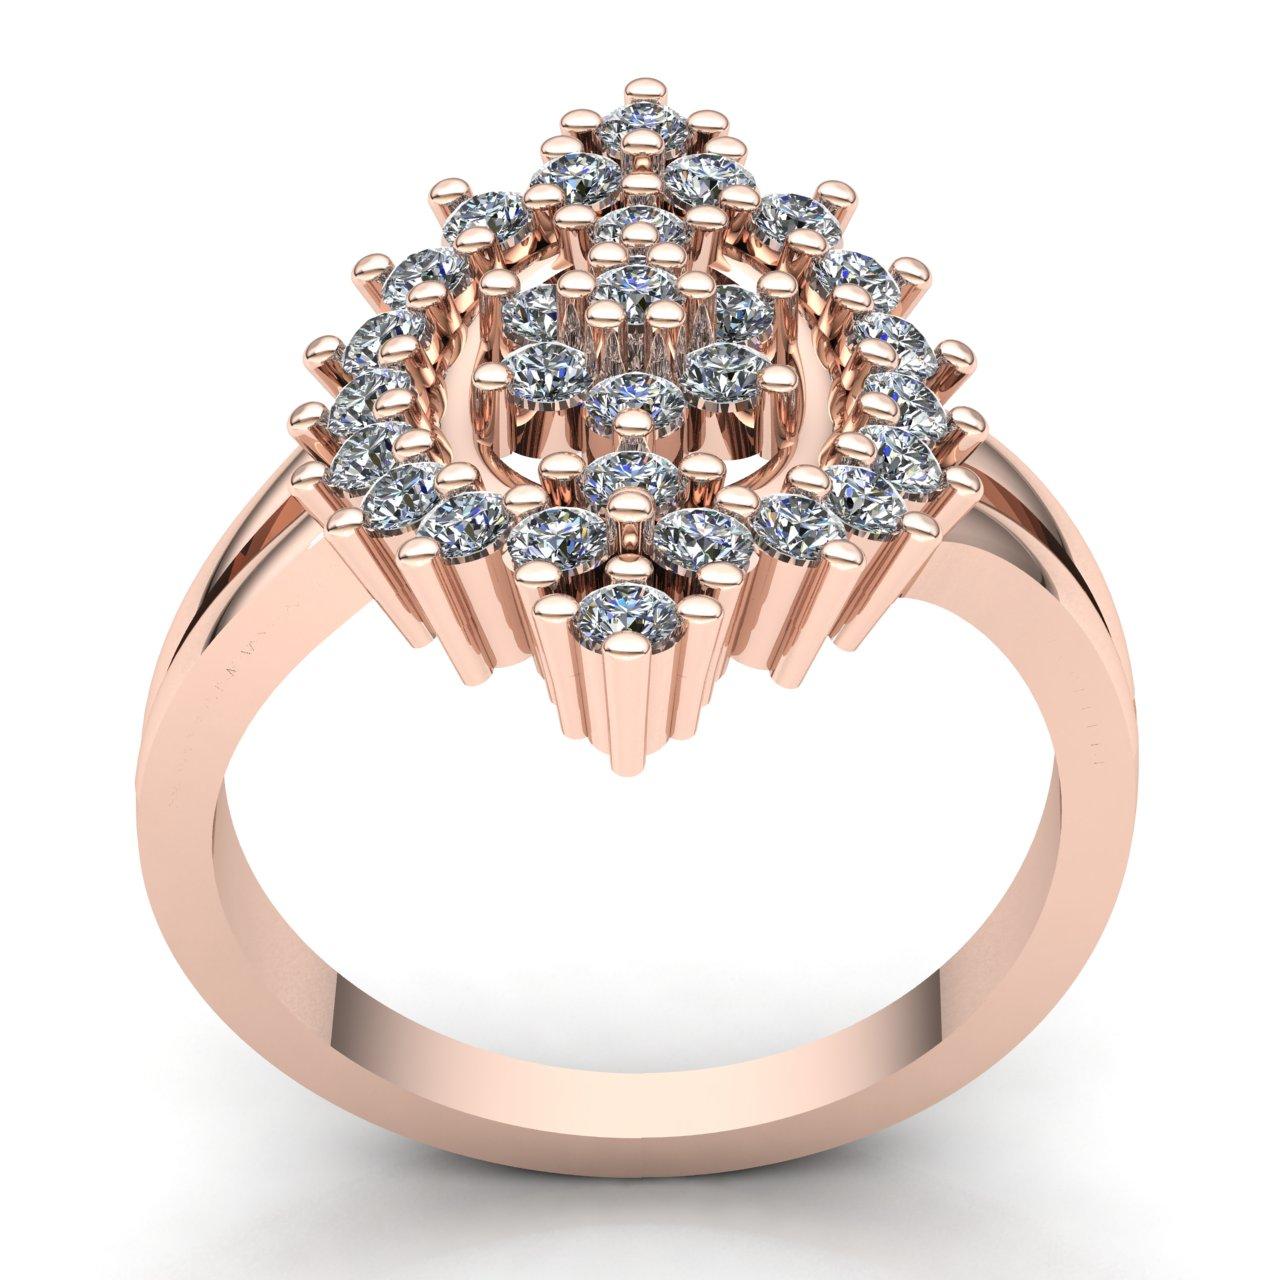 1-Quilate-Diamante-Brillante-Redondo-Mujer-Novia-Flor-Halo-Anillo-de-Compromiso miniatura 8